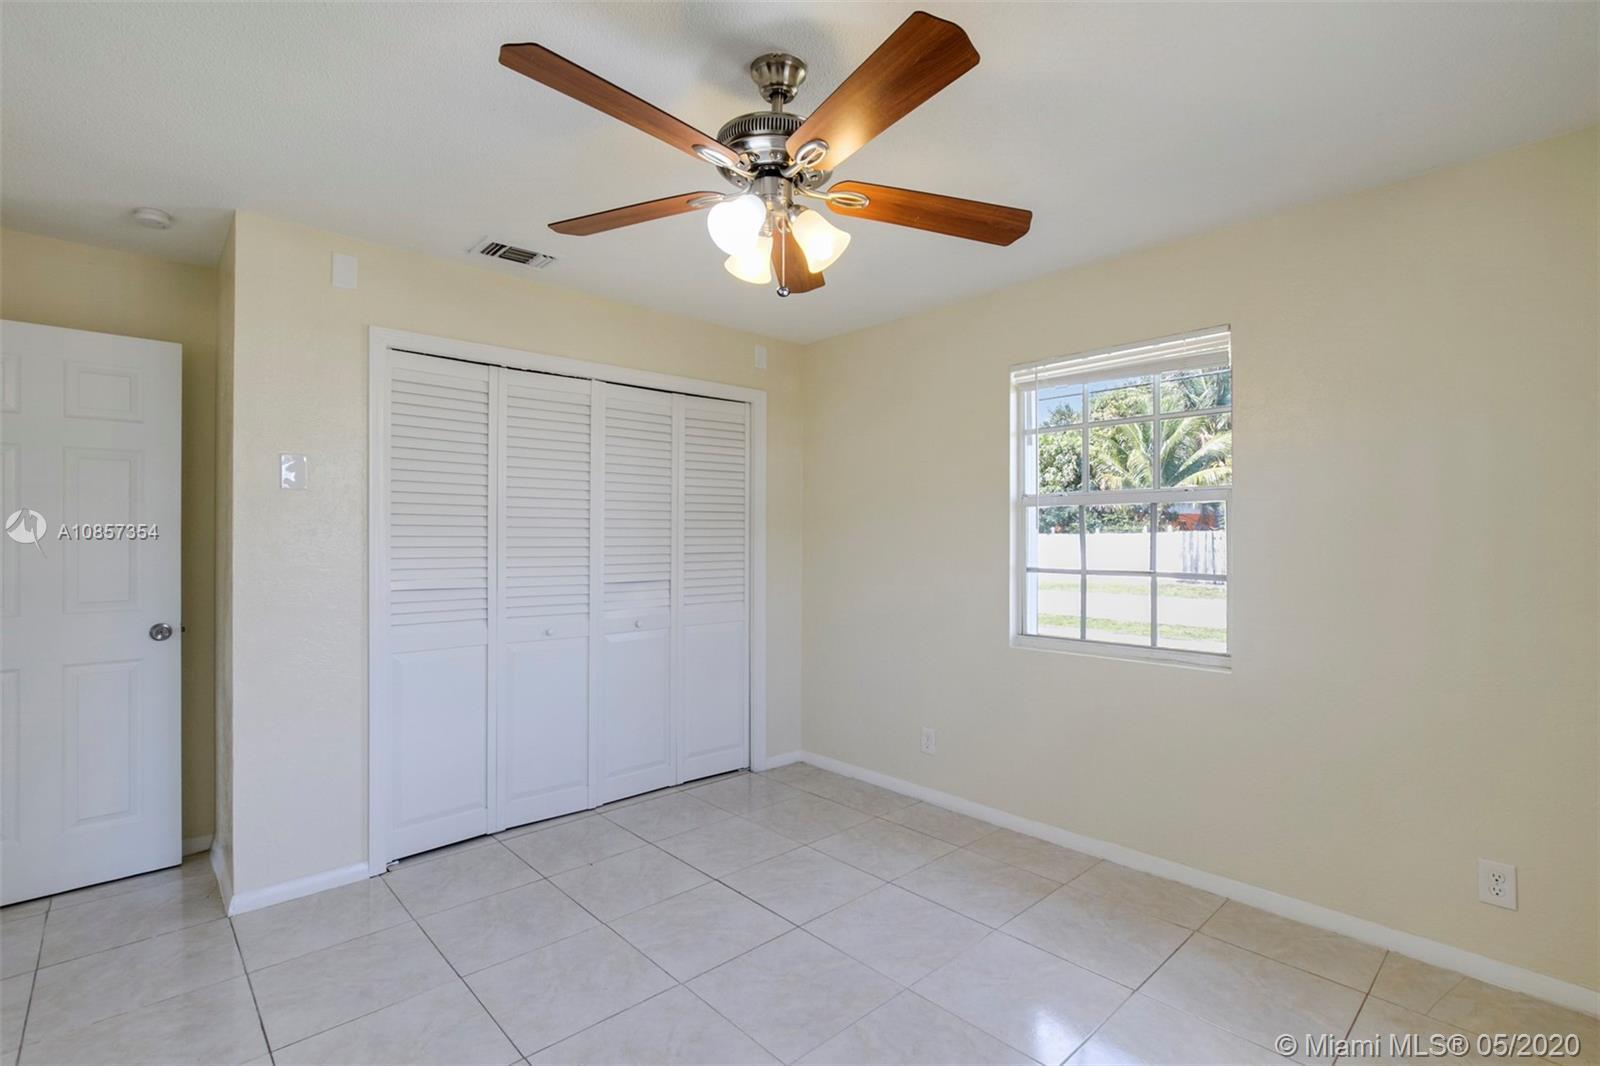 Homes for Sale in Zip Code 33462